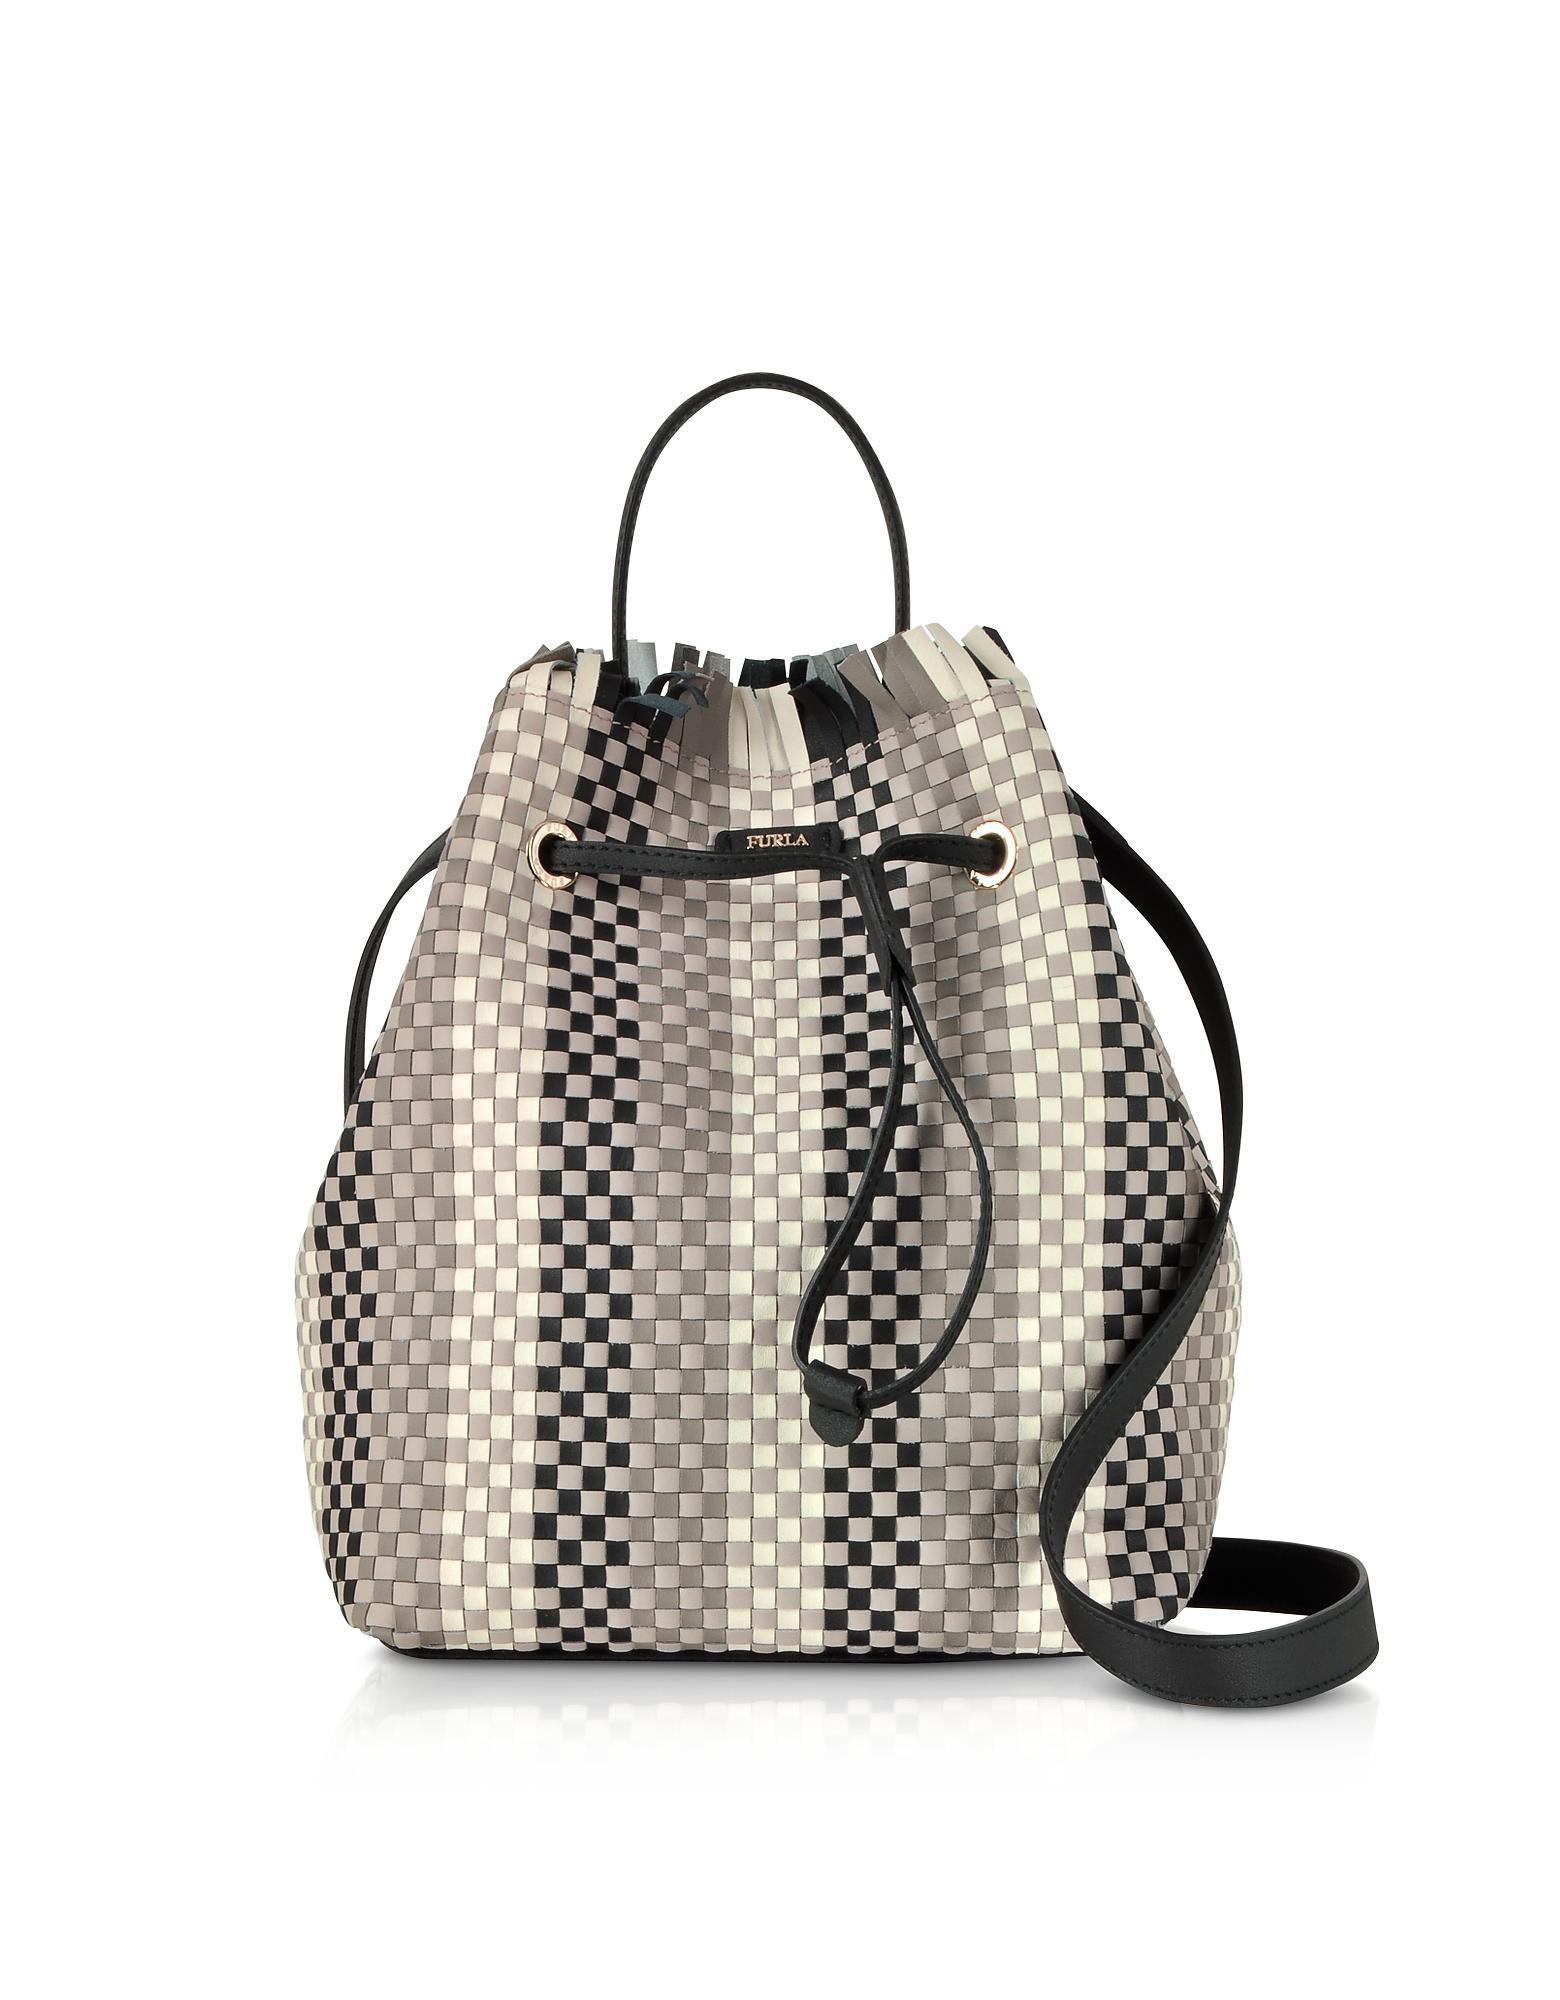 Stacy Casanova Small Drawstring Bag in Onyx and Petalo Calfskin Furla 0RoRhAp